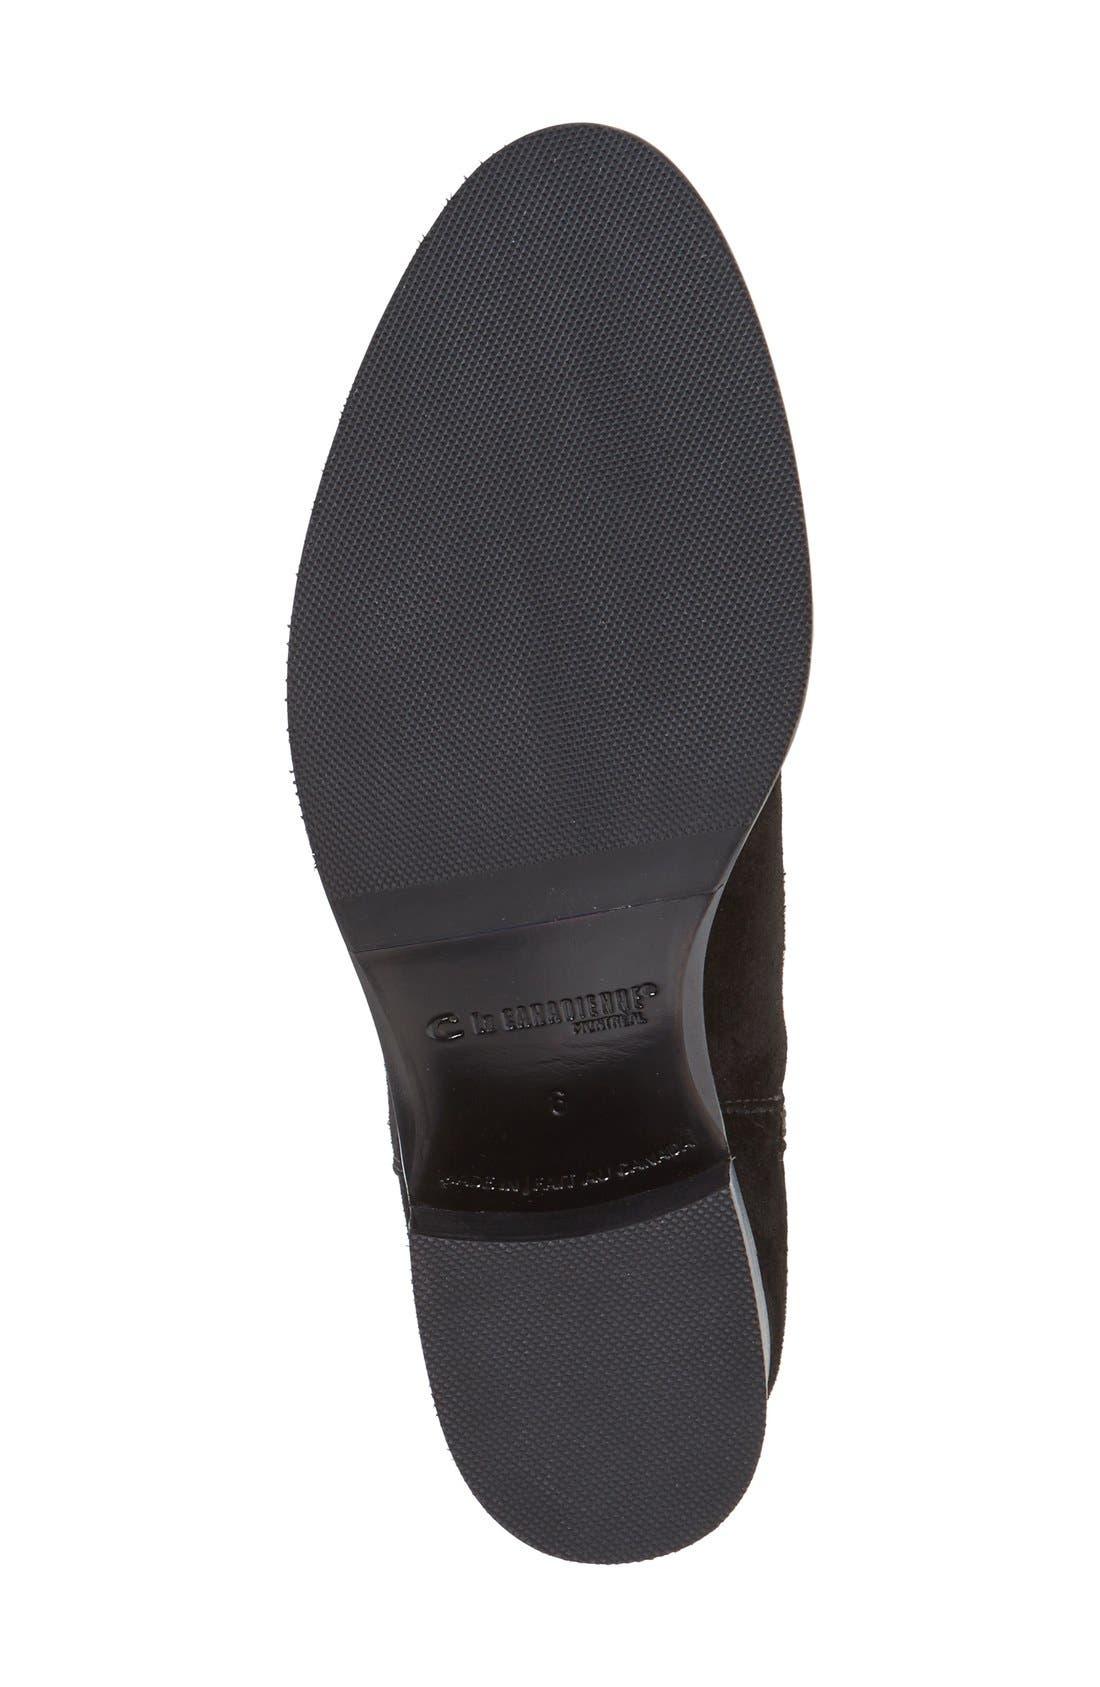 LA CANADIENNE, 'Polly' Waterproof Knee High Boot, Alternate thumbnail 4, color, BLACK SUEDE